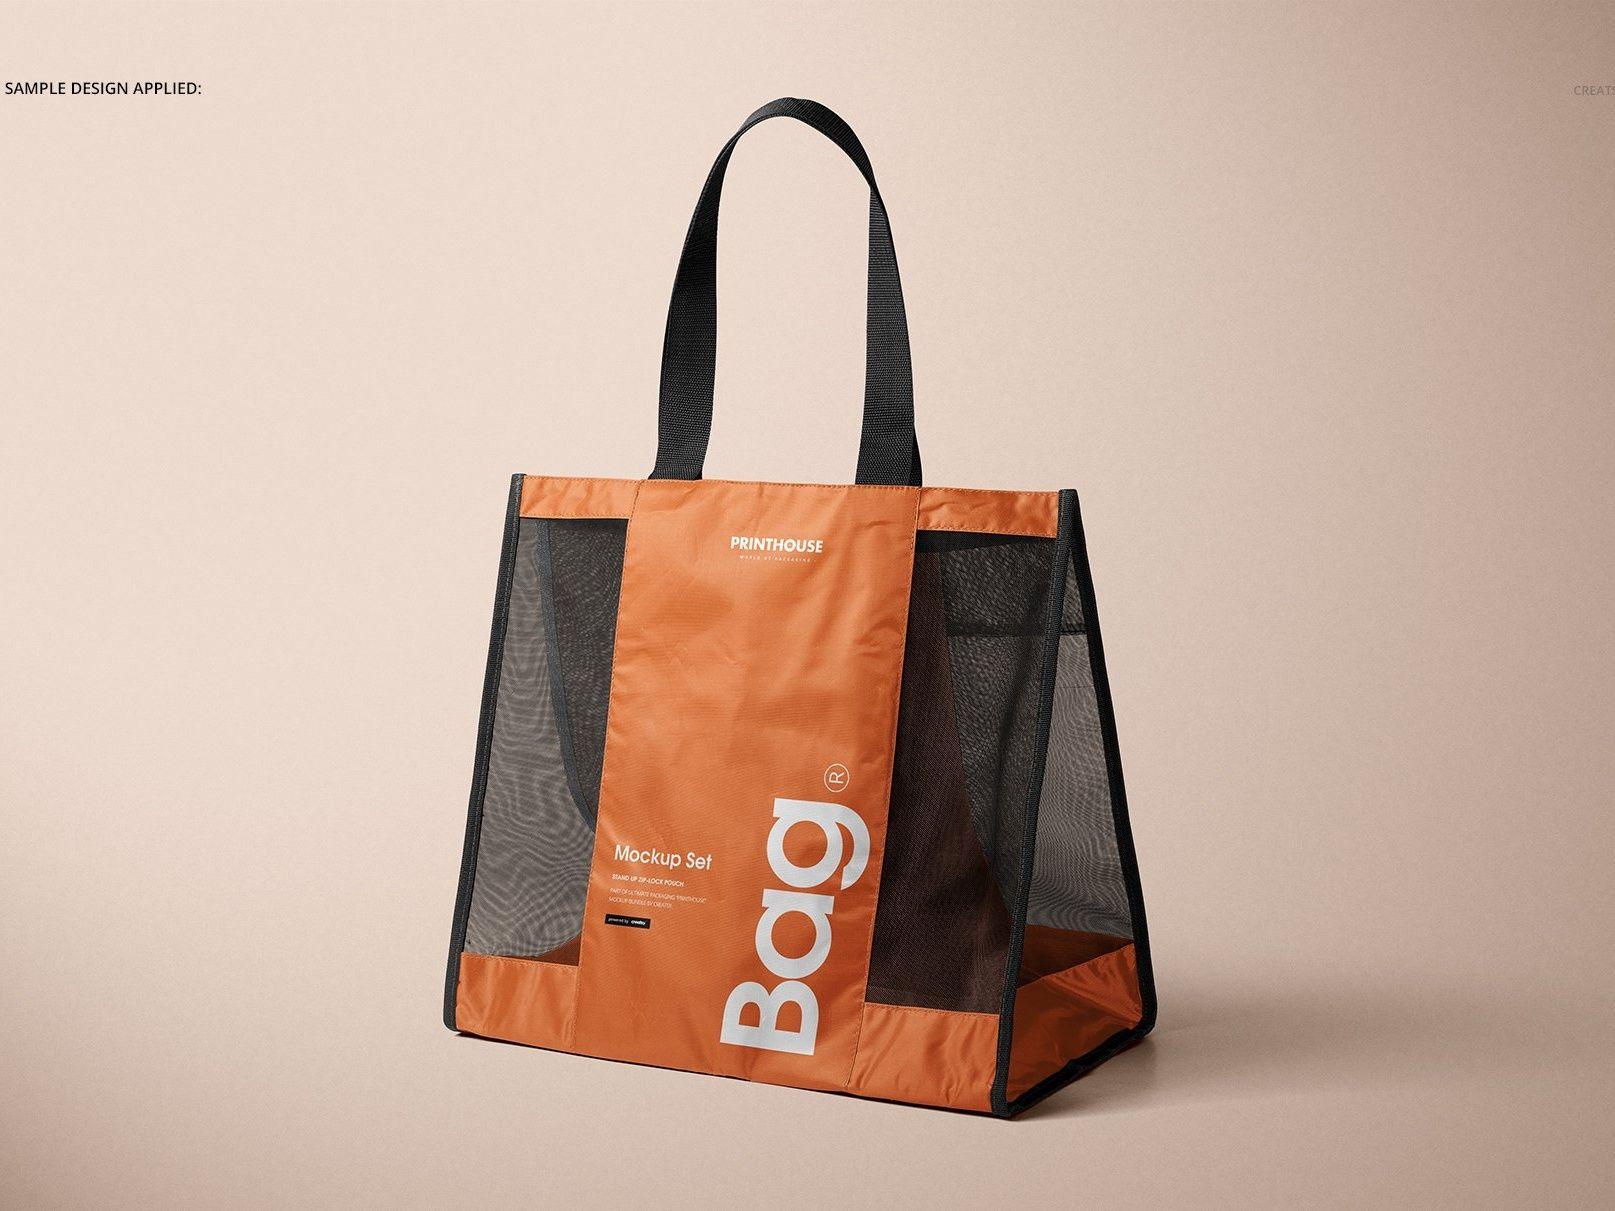 Download Mesh Shopping Tote Bag Mockup Set Shopping Tote Bag Shopping Tote Tote Bag